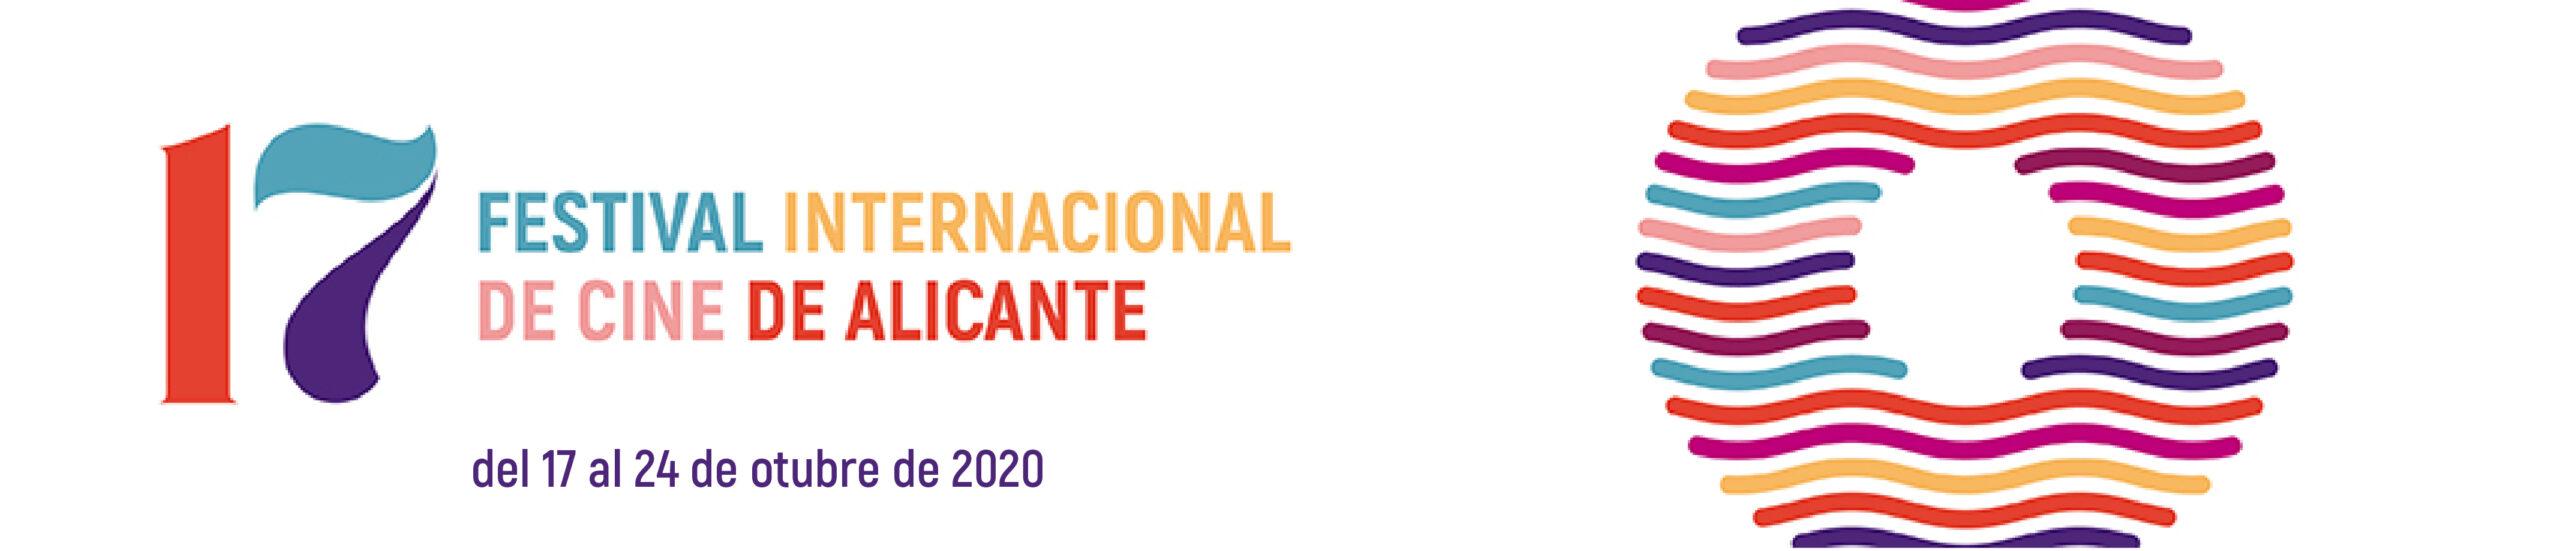 Festival Internacional de Cine de Alicante